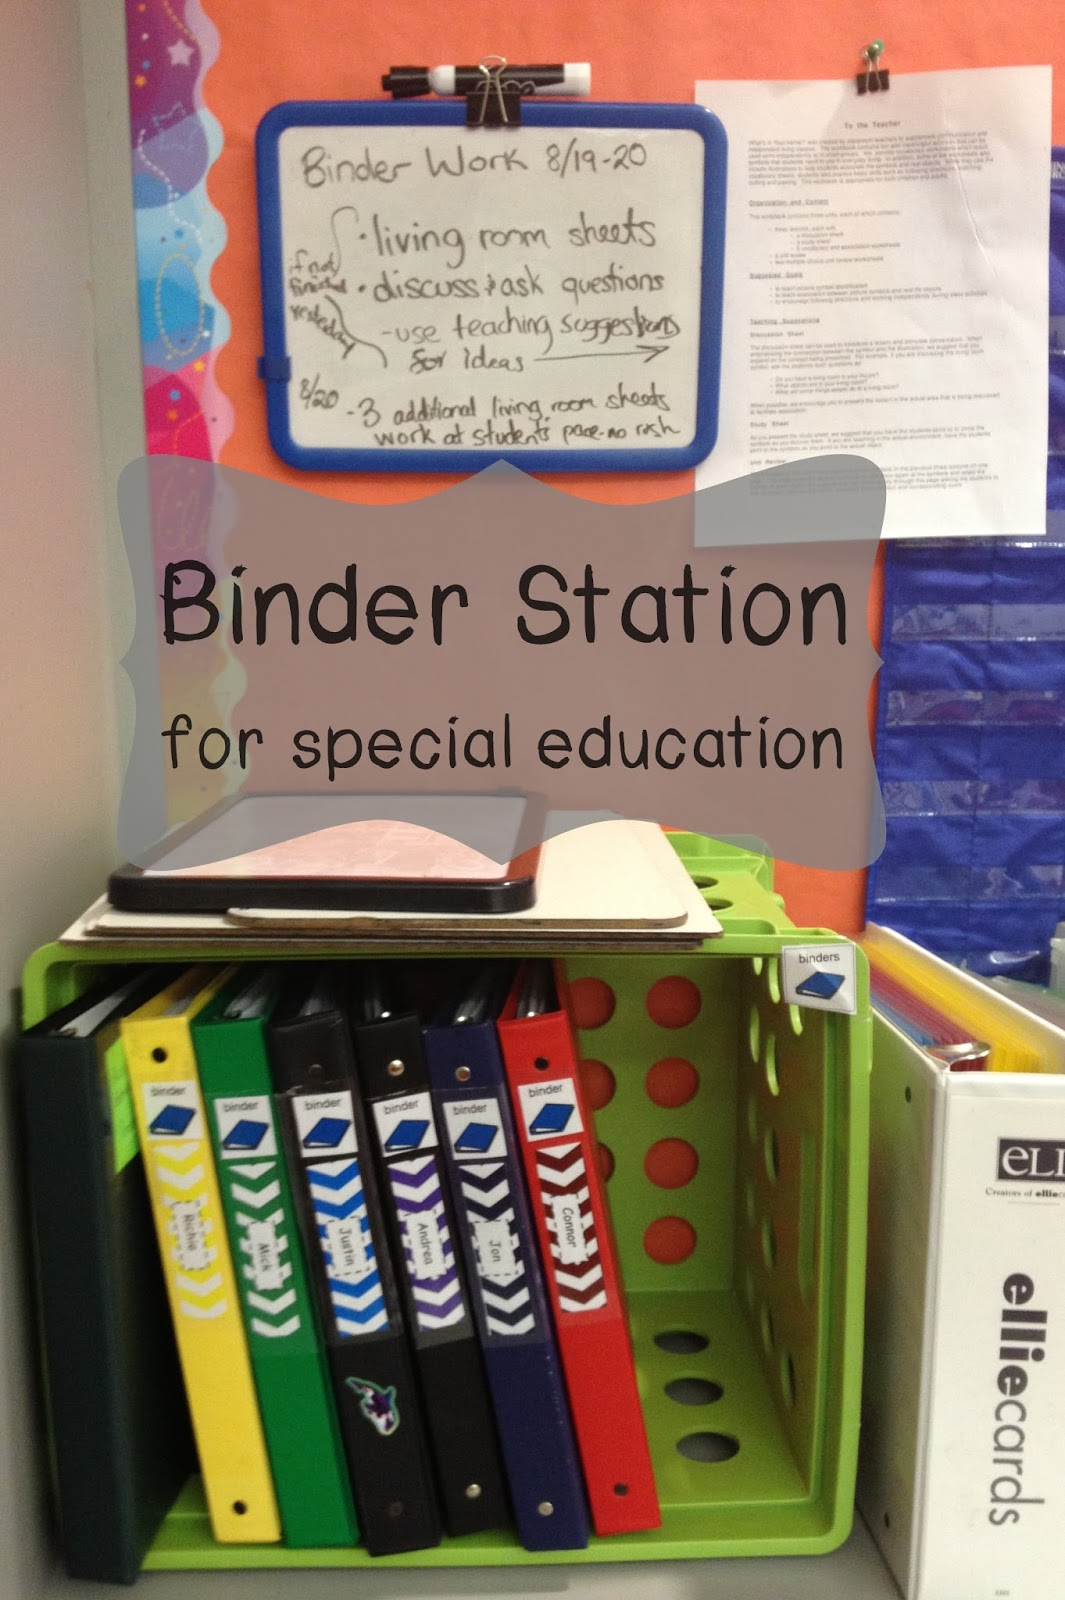 Binder Work Station For Special Education